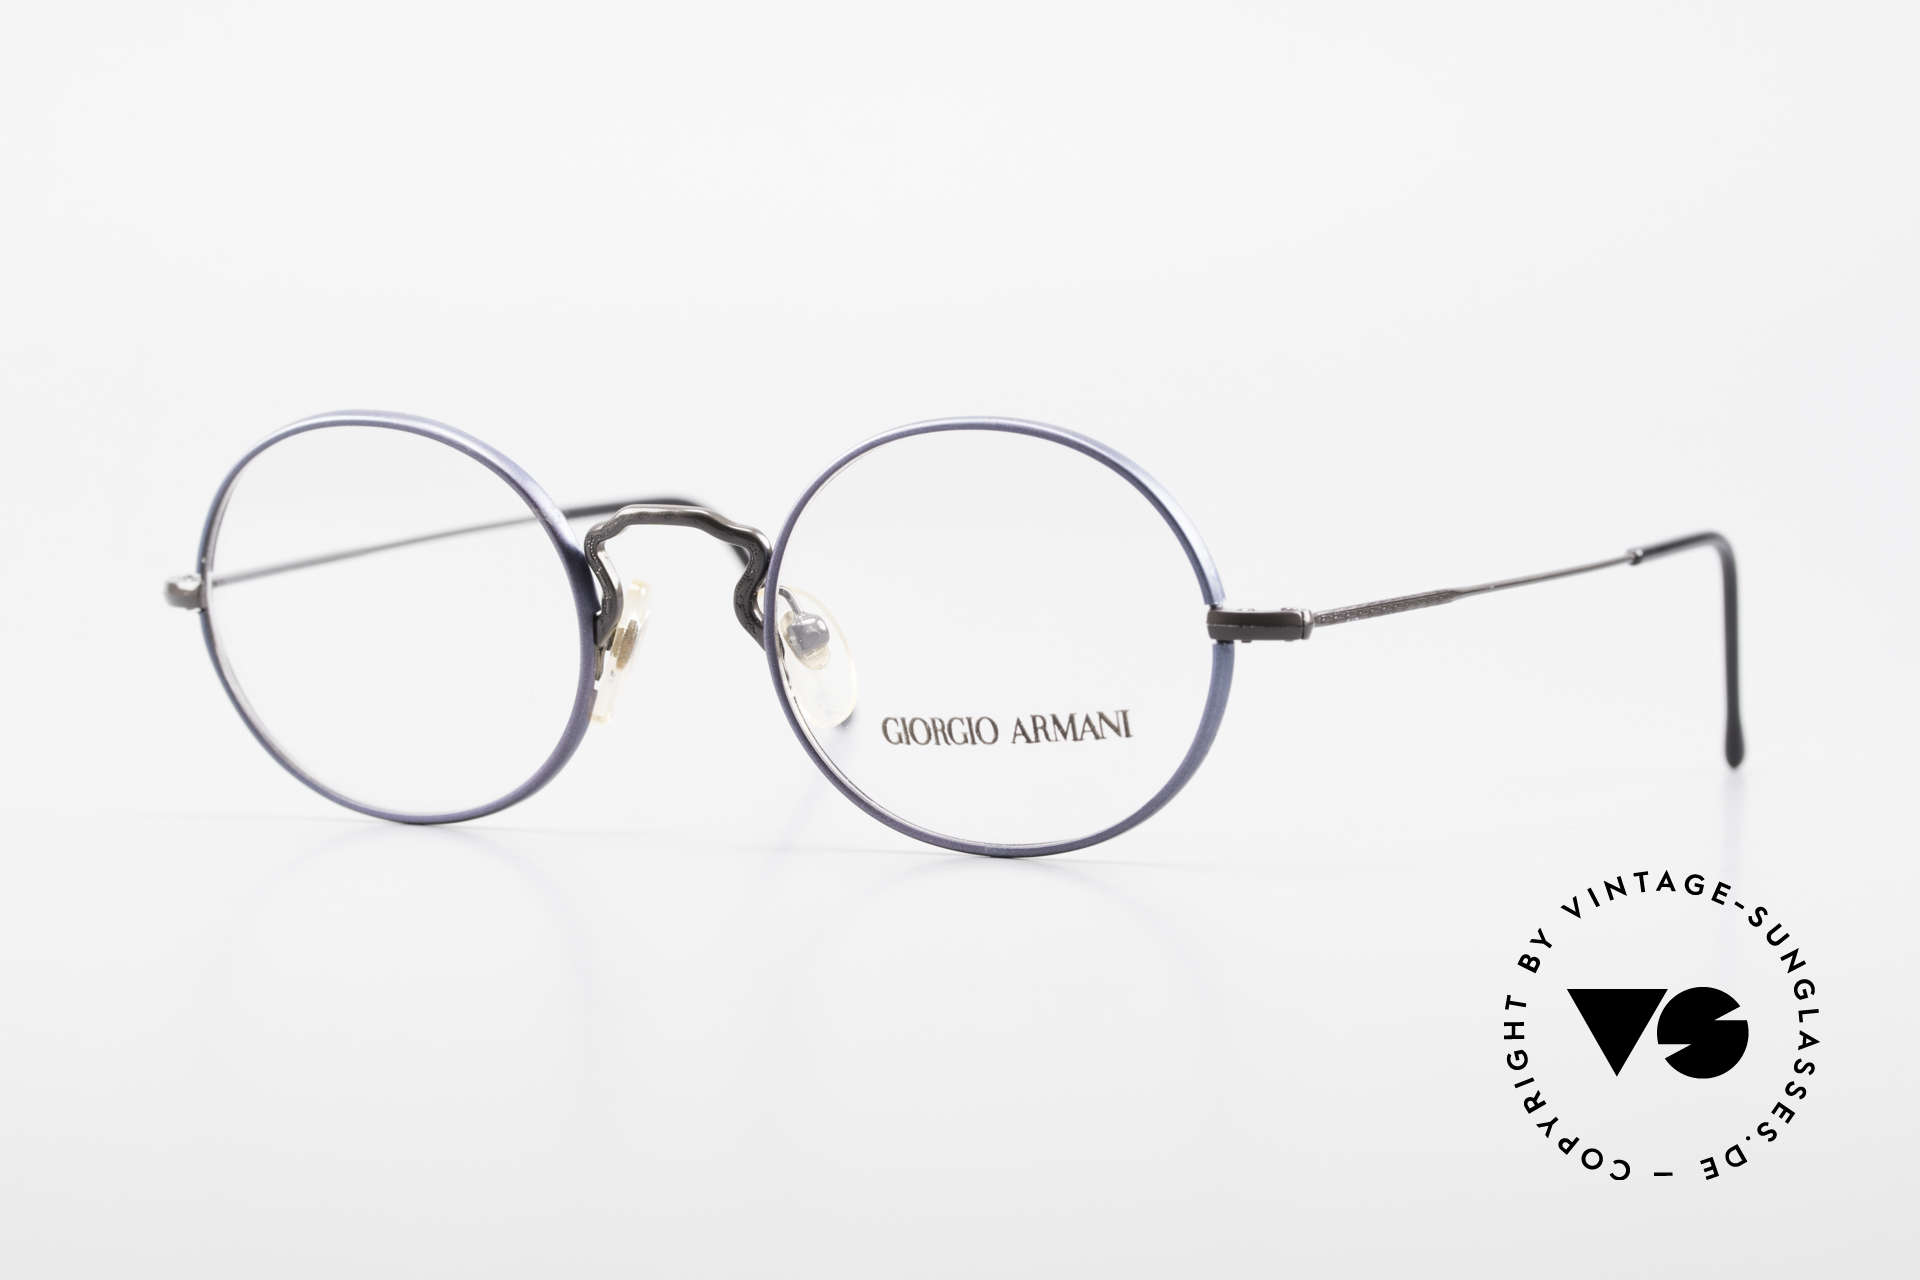 Giorgio Armani 247 No Retro Eyeglasses 90's Oval, vintage designer eyeglasses by Giorgio Armani, Italy, Made for Men and Women